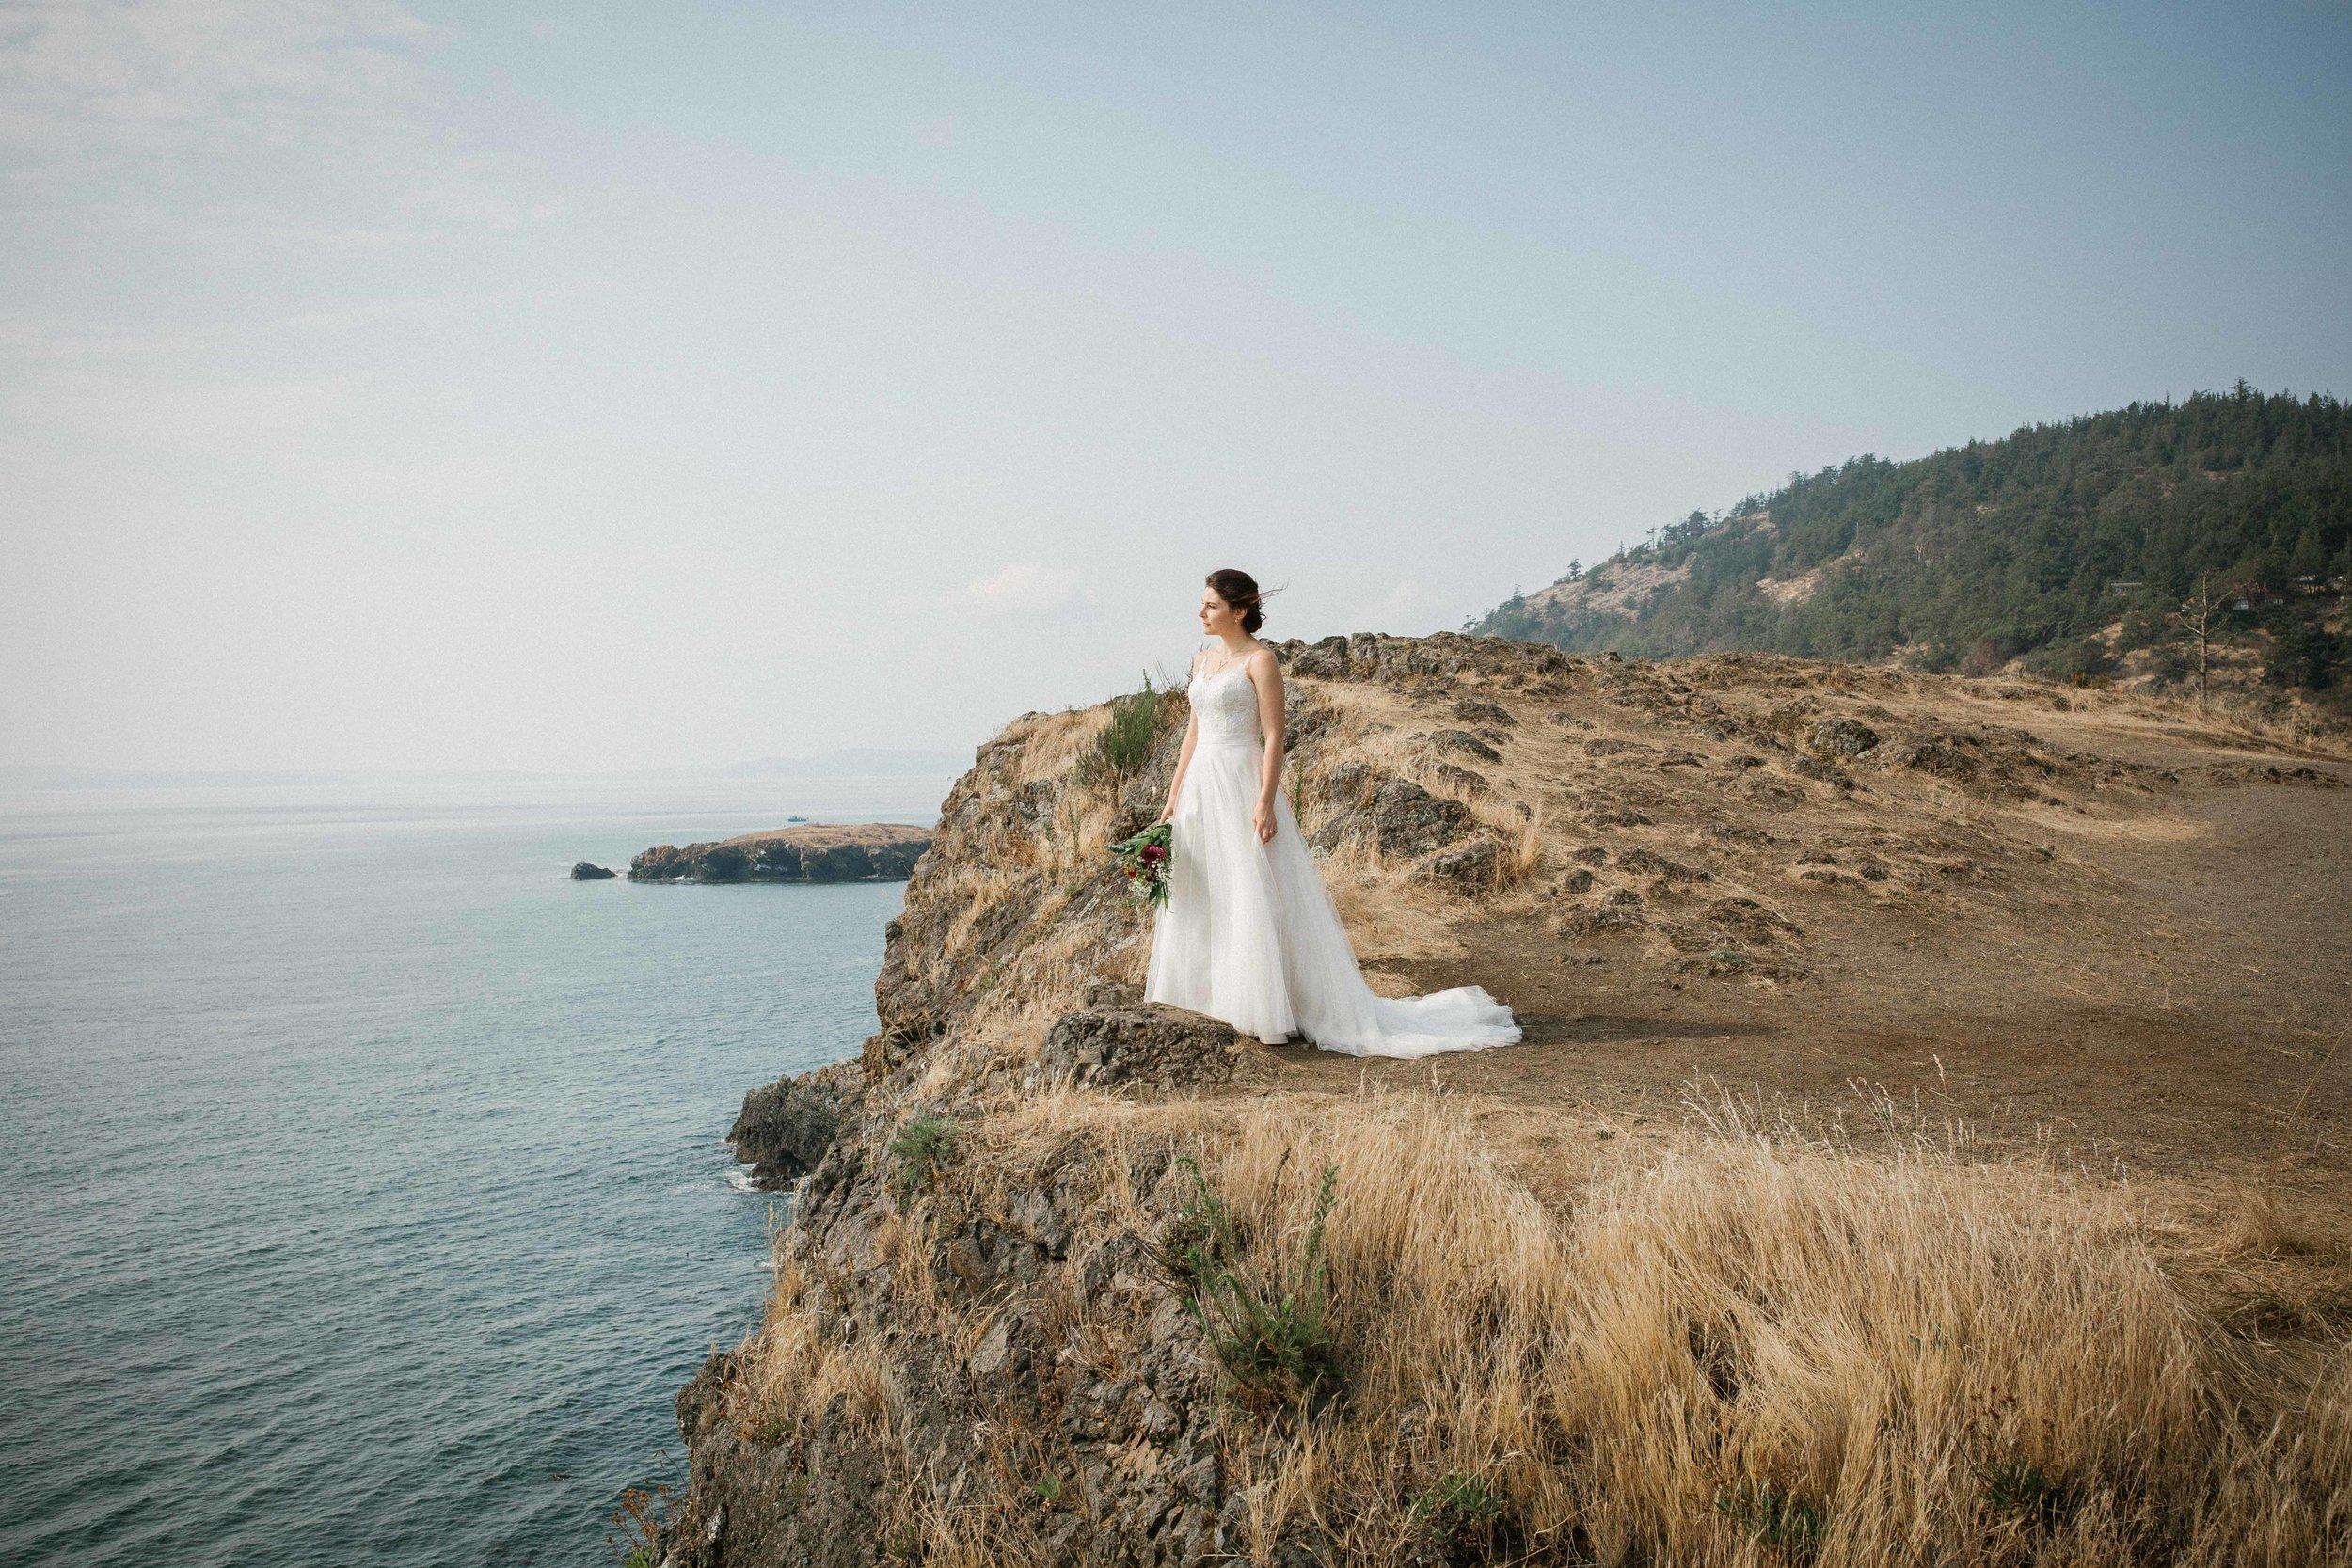 deception-pass-wedding-45.jpg